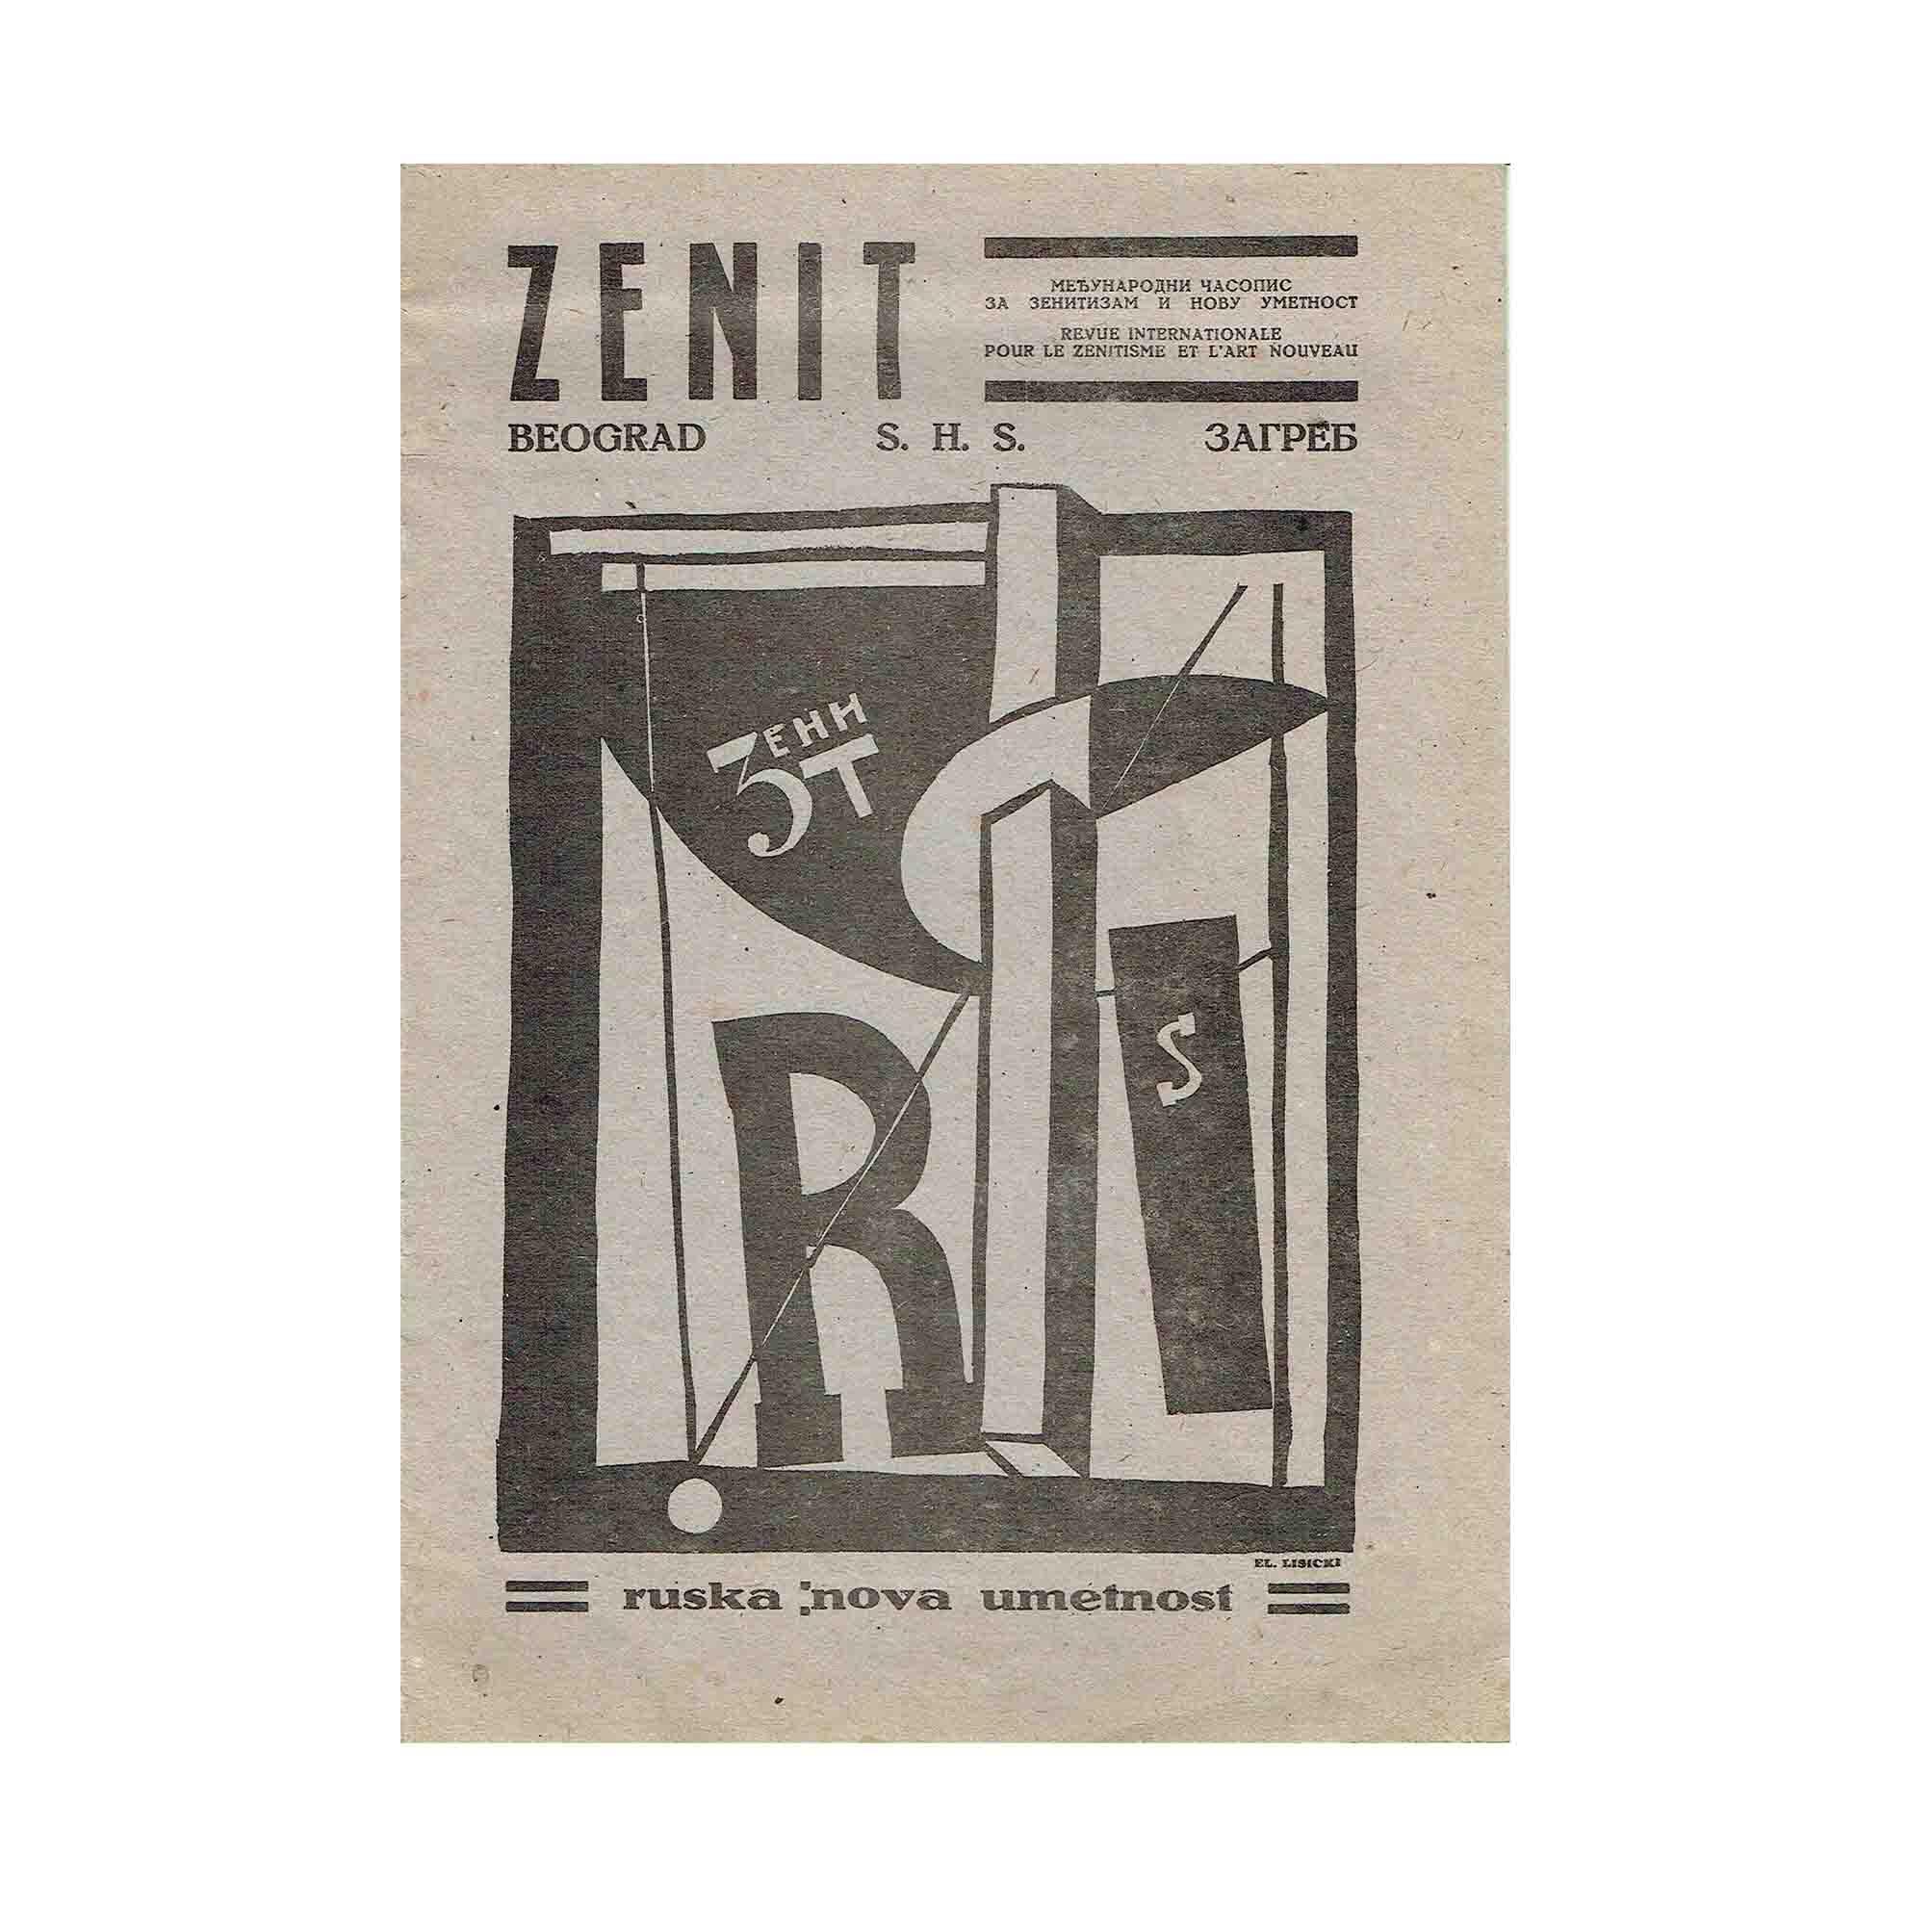 5641 Zenit 17-18 1922 Russland Lissitzky Reprint 1983 Umschlag N